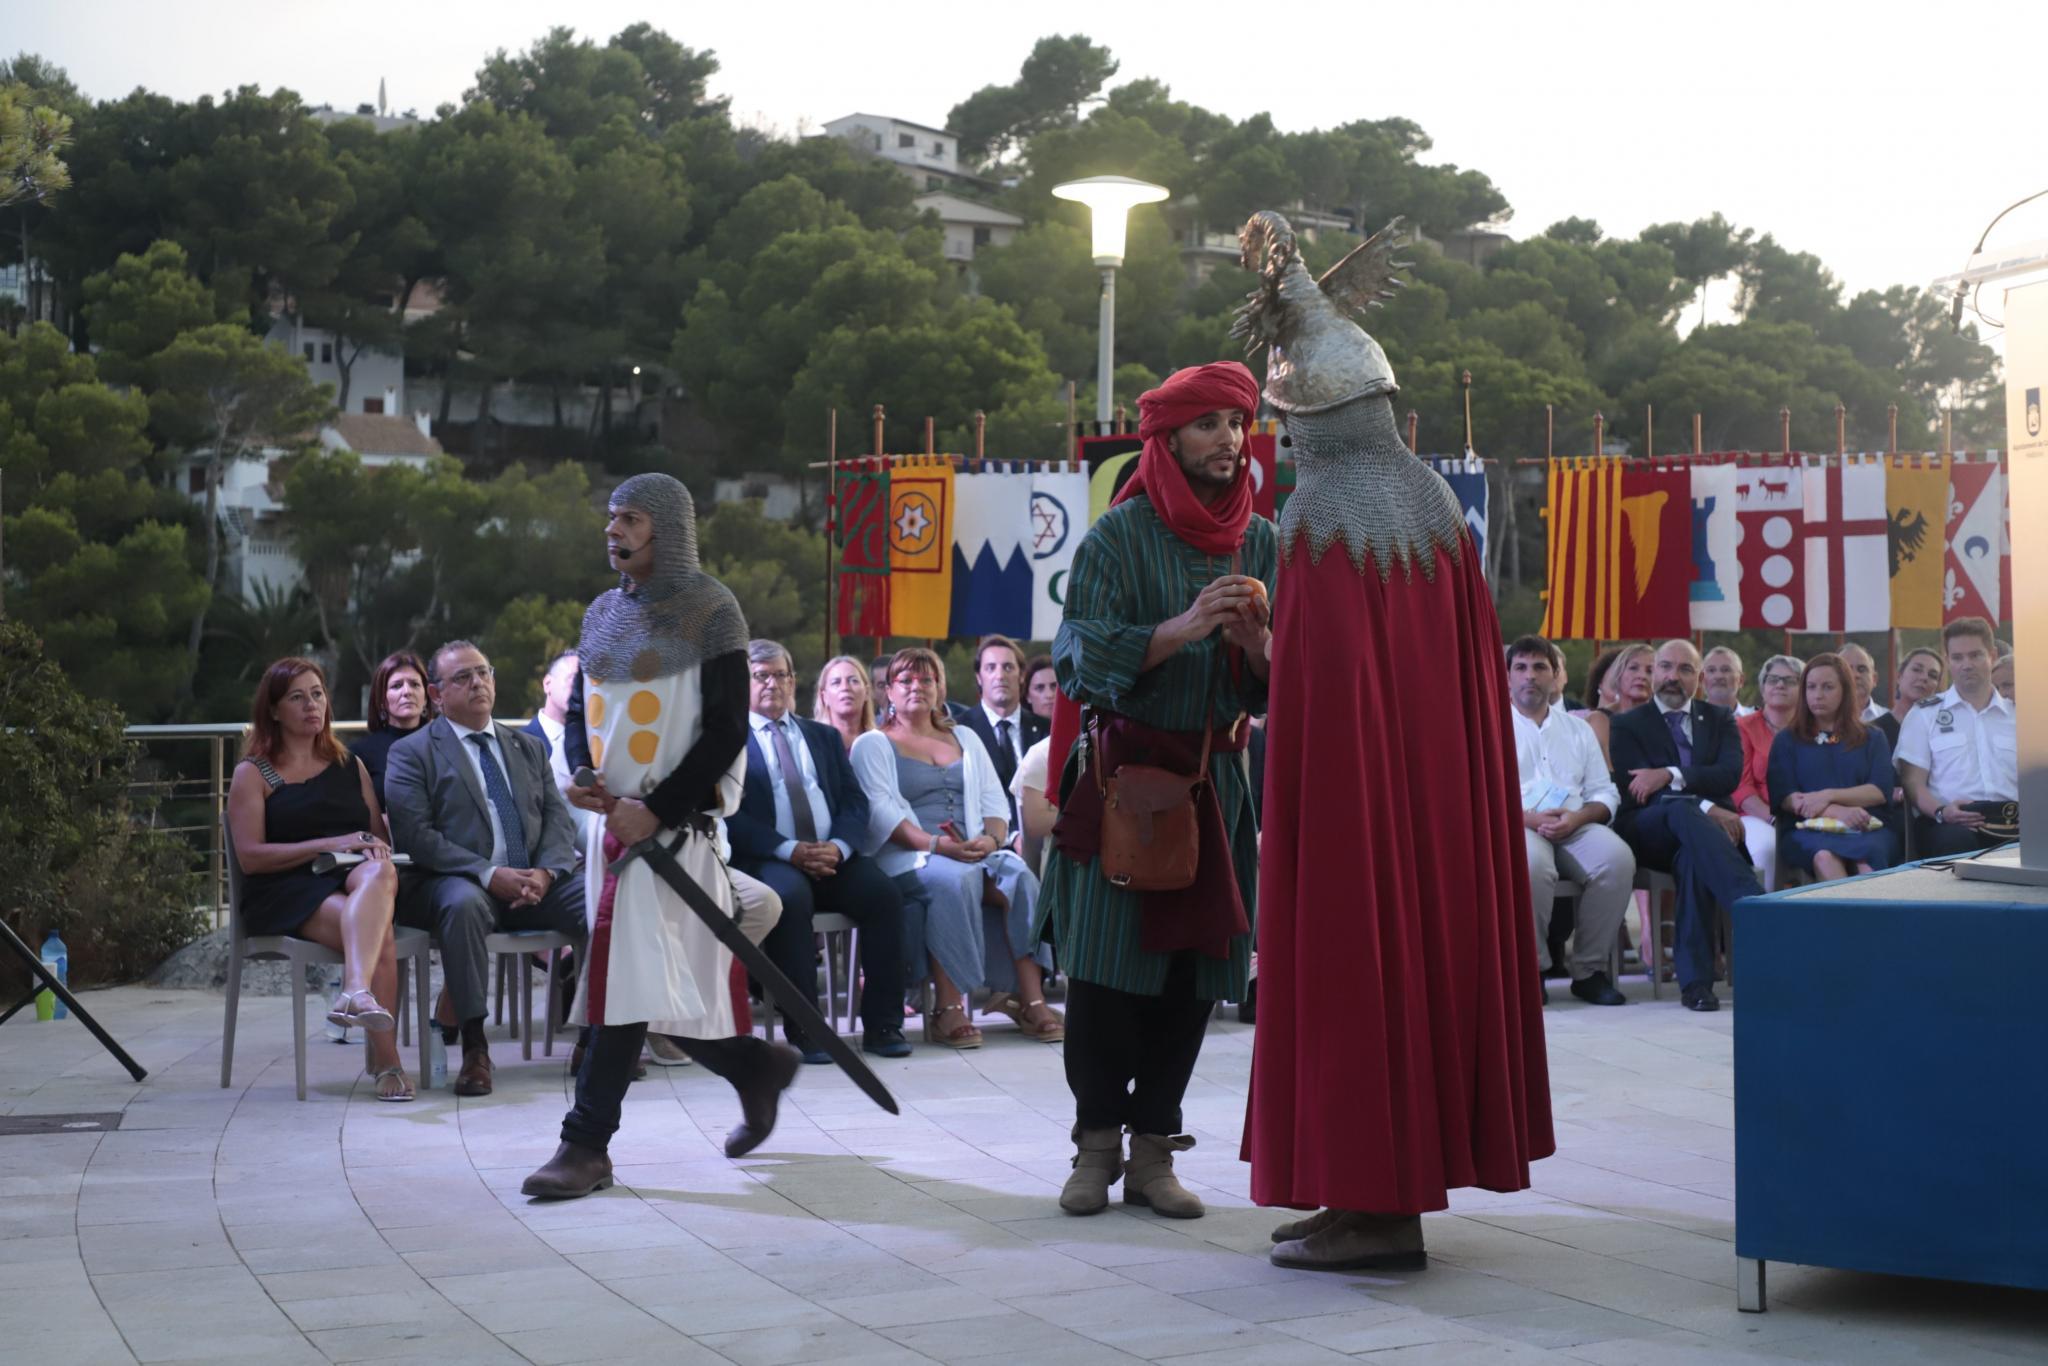 Rei en Jaume festival in Santa Ponça